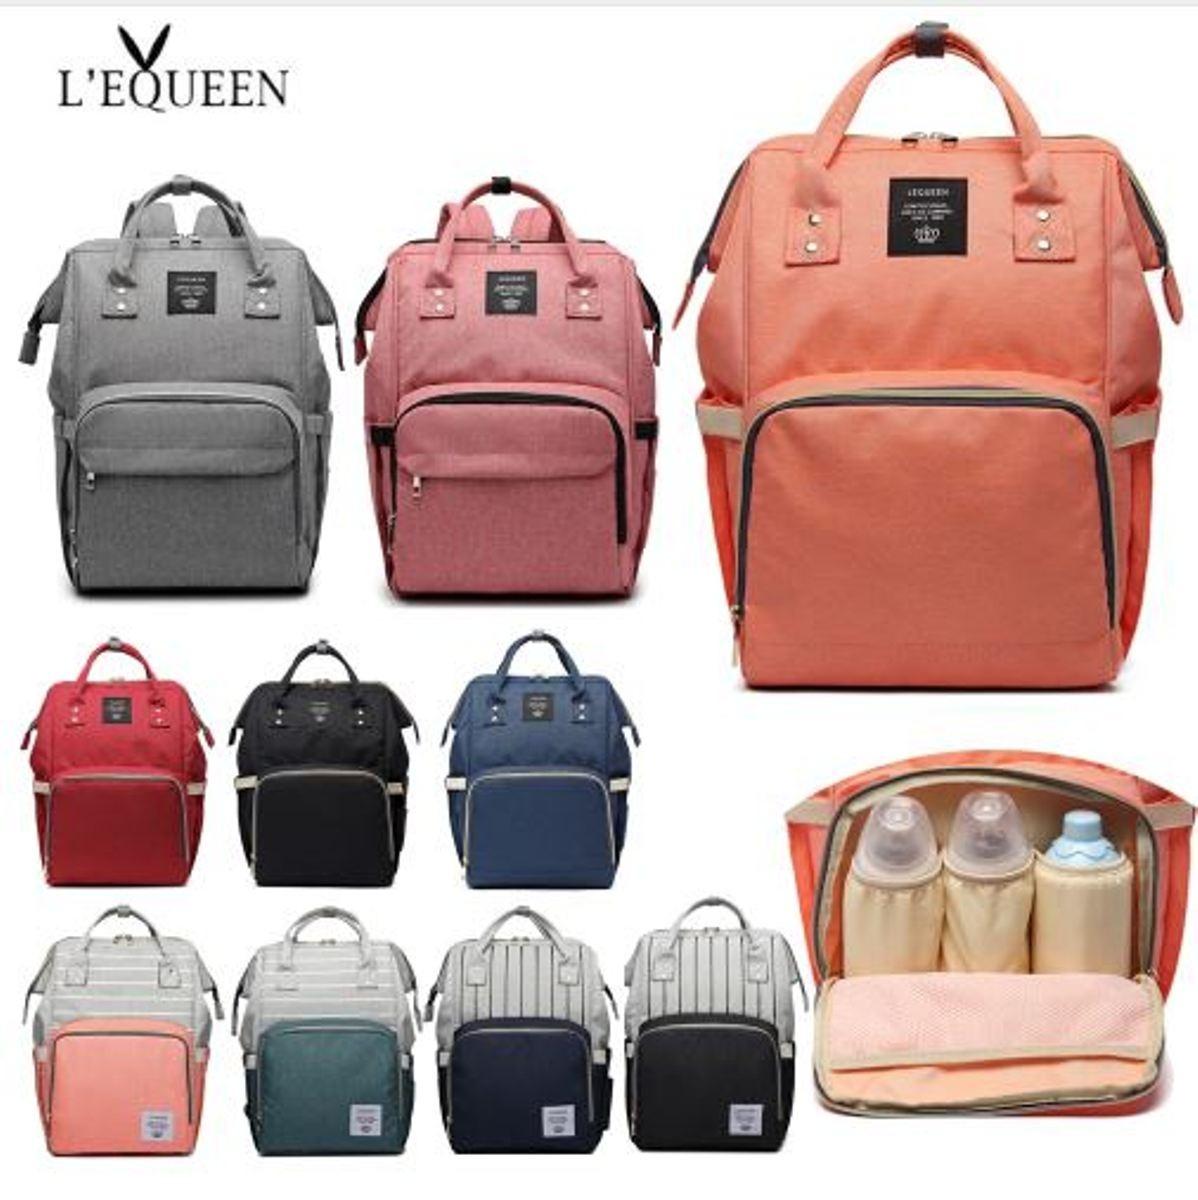 499b0ea52 bolsa mochila maternidade lequeen mala barata melhor oferta. Carregando  zoom.